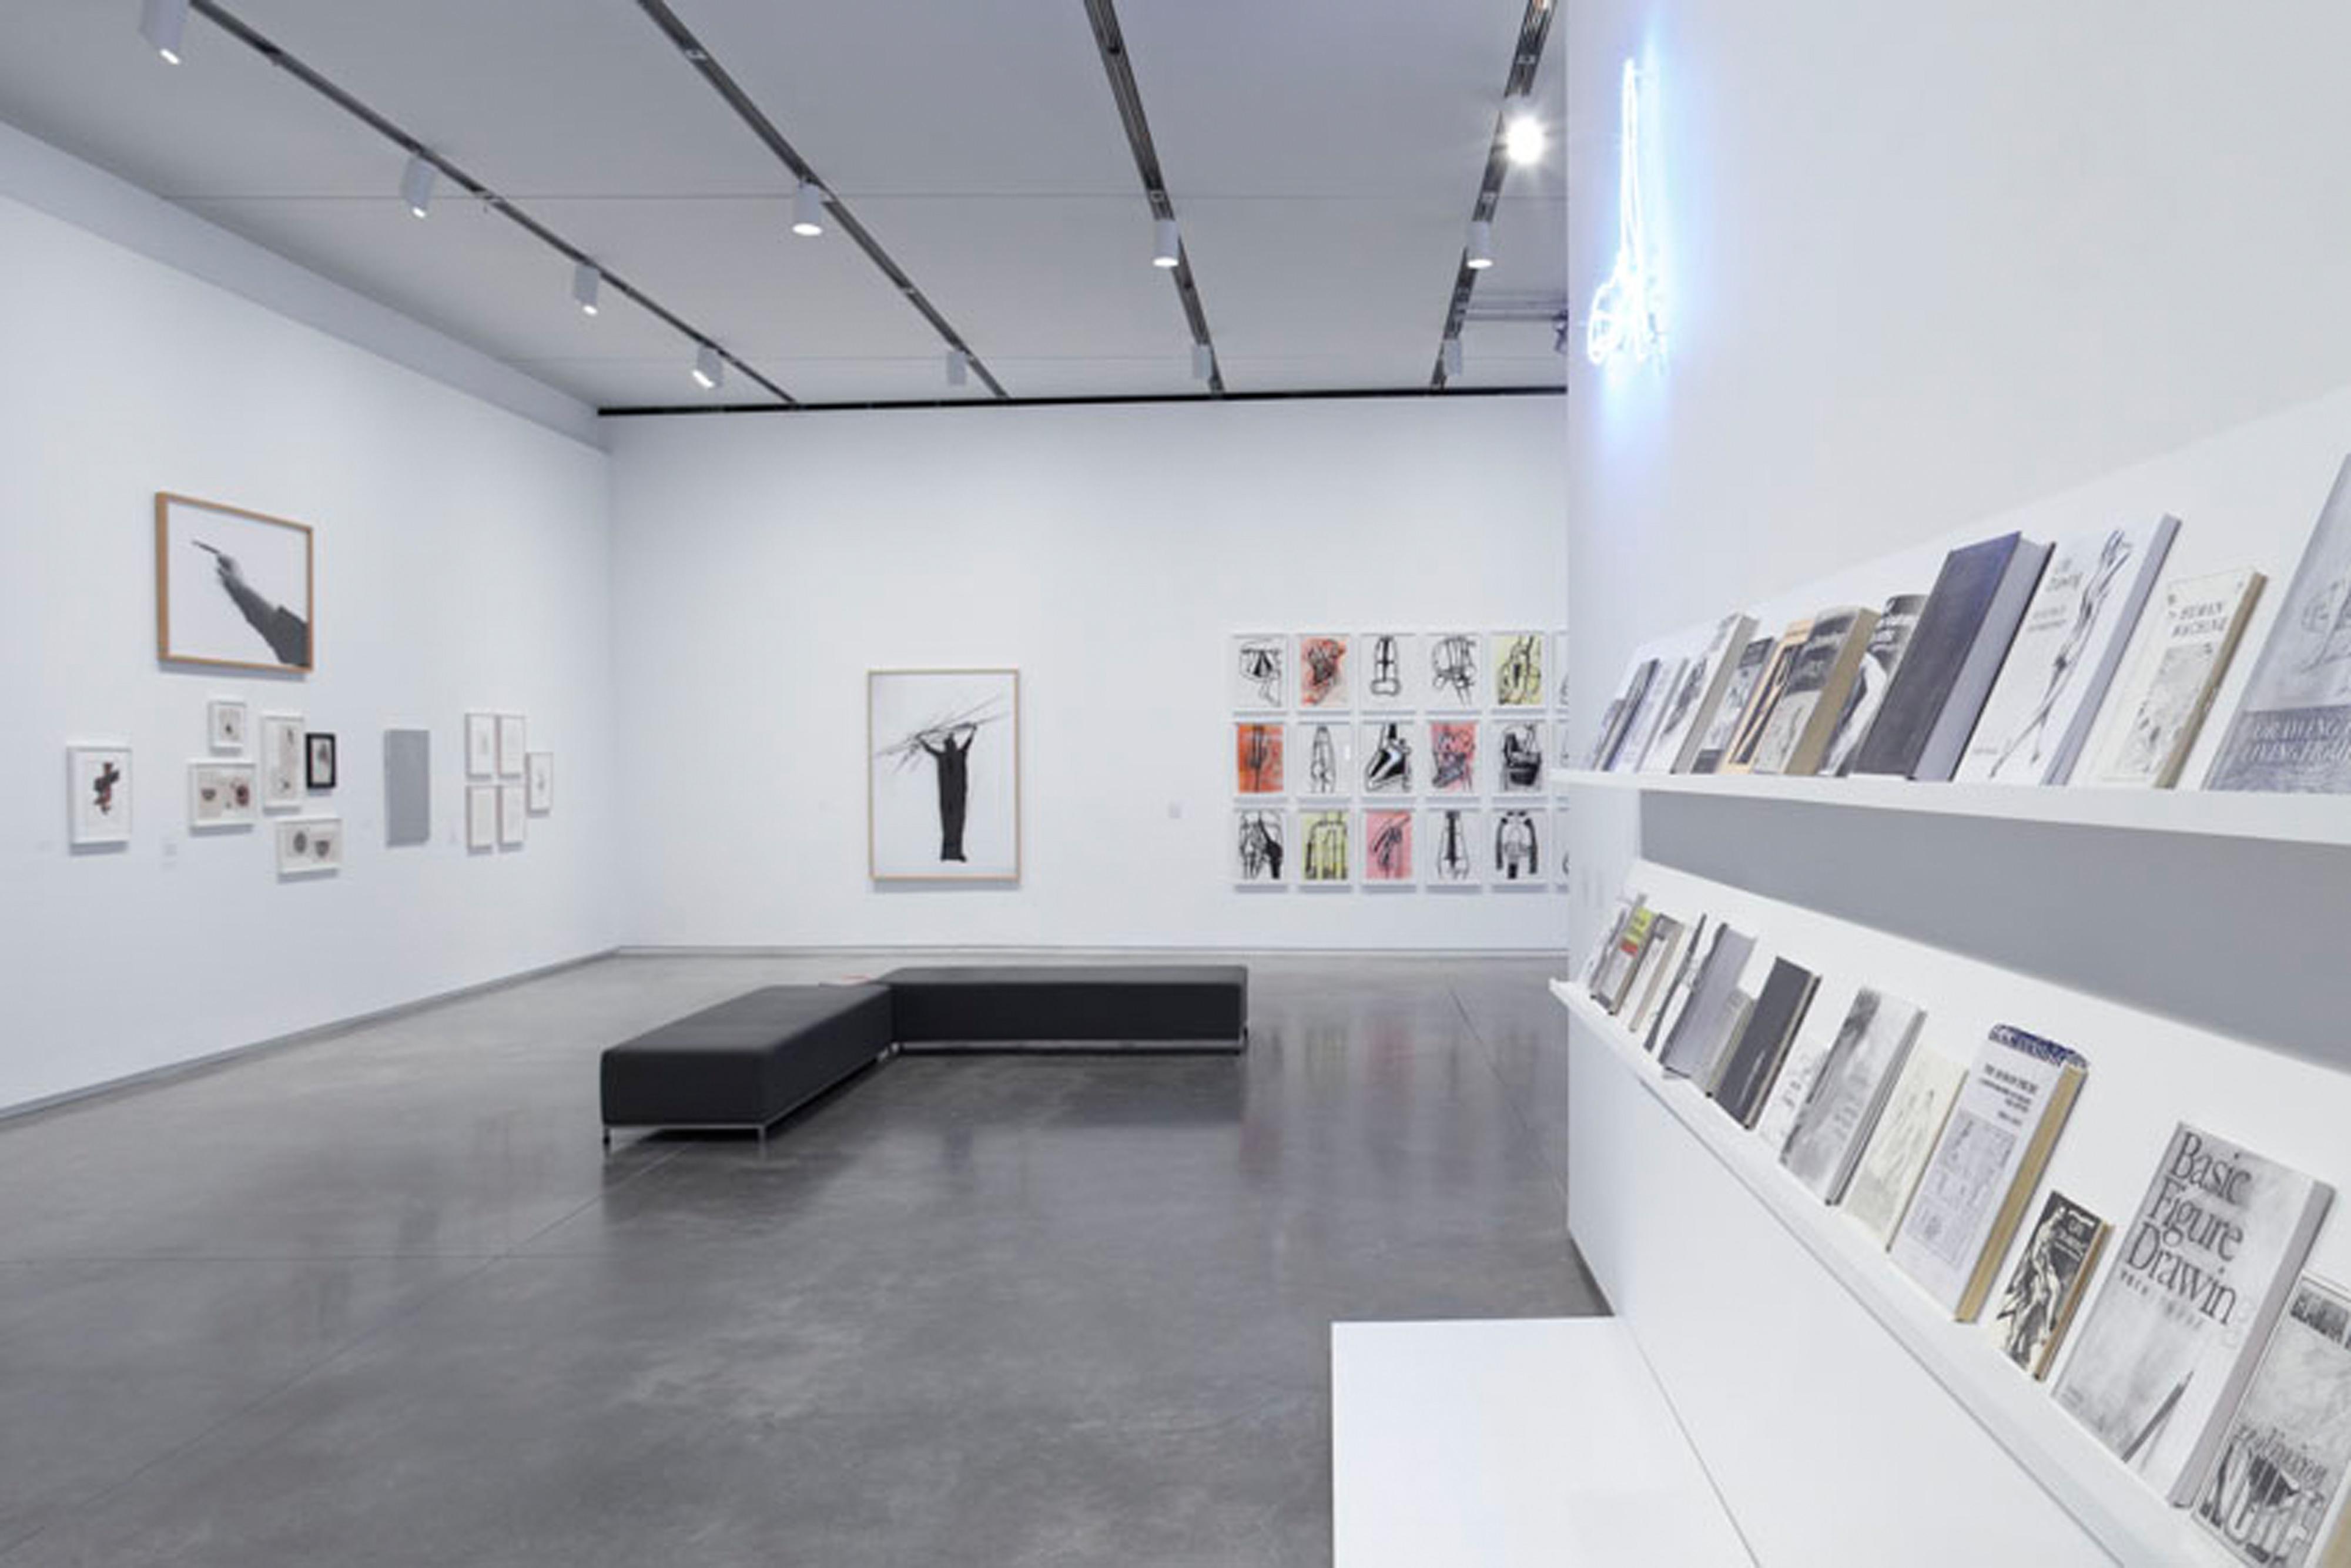 Galerie Barbara Thumm \ Fiona Banner aks The Vanity Press – Dance/ Draw